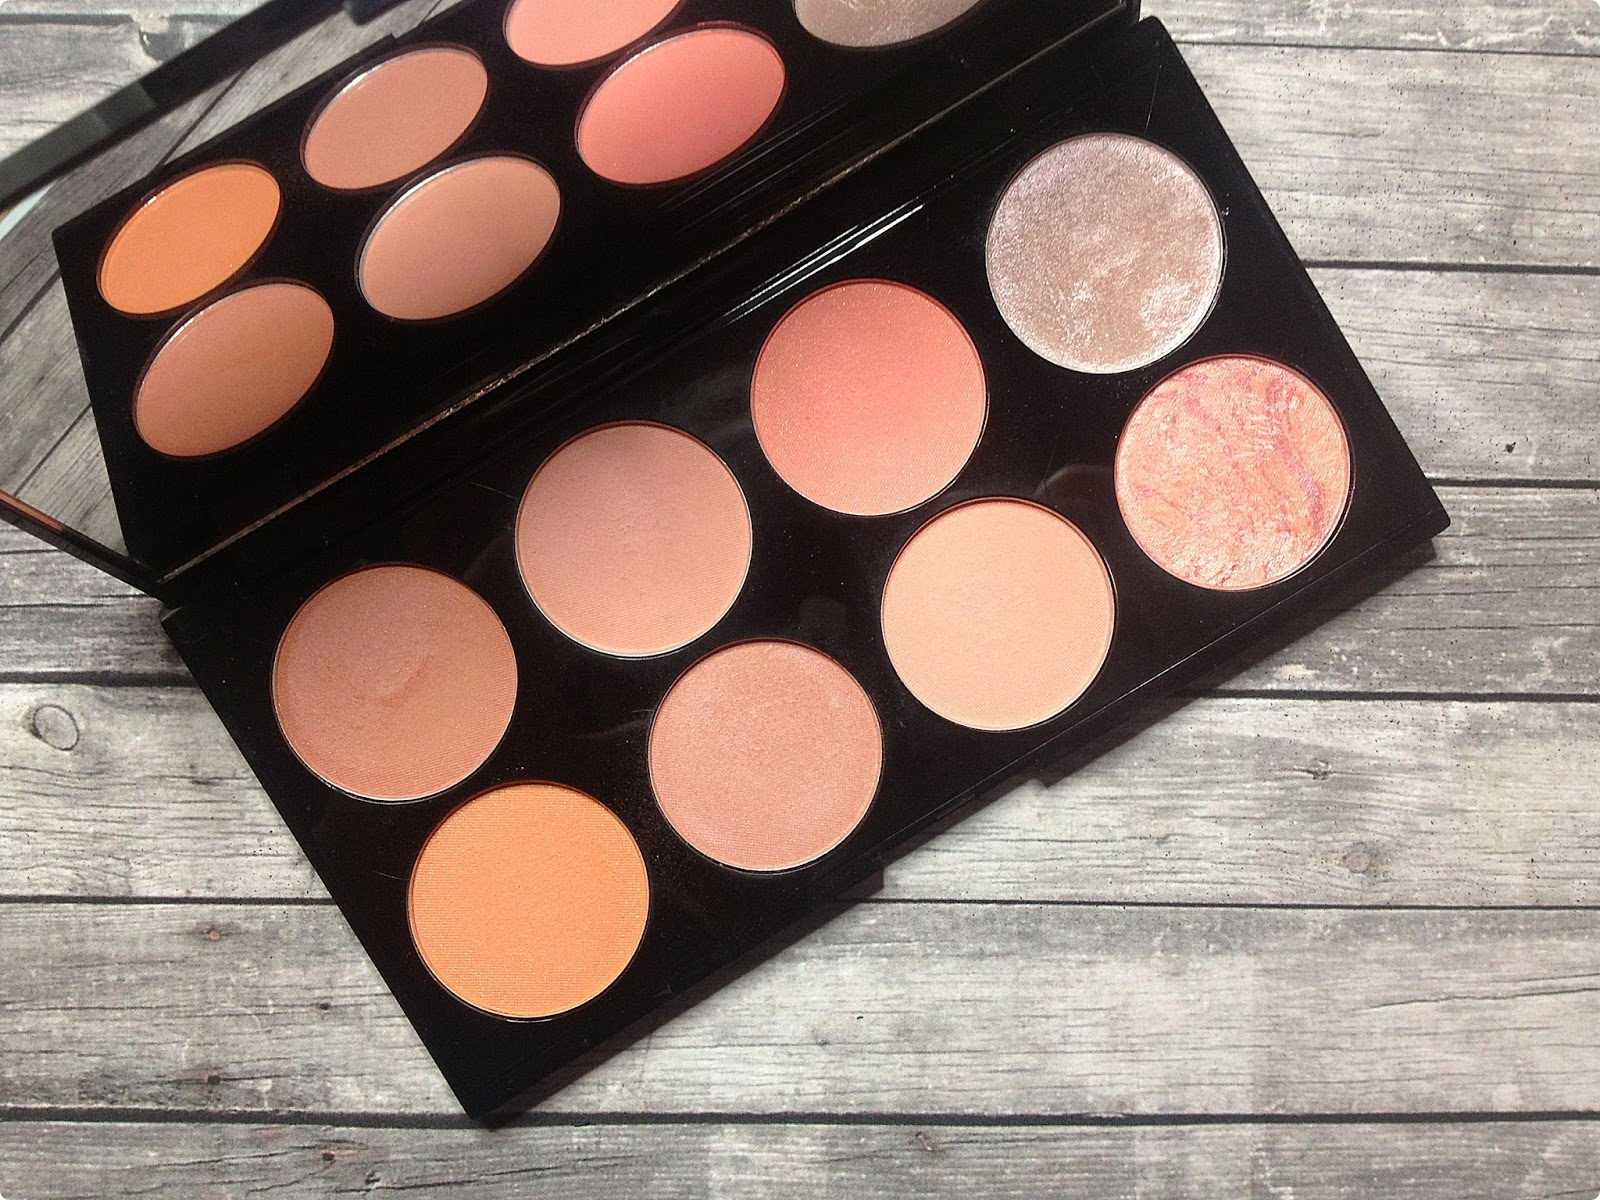 Paleta róży Hot Spice, Makeup Revolution